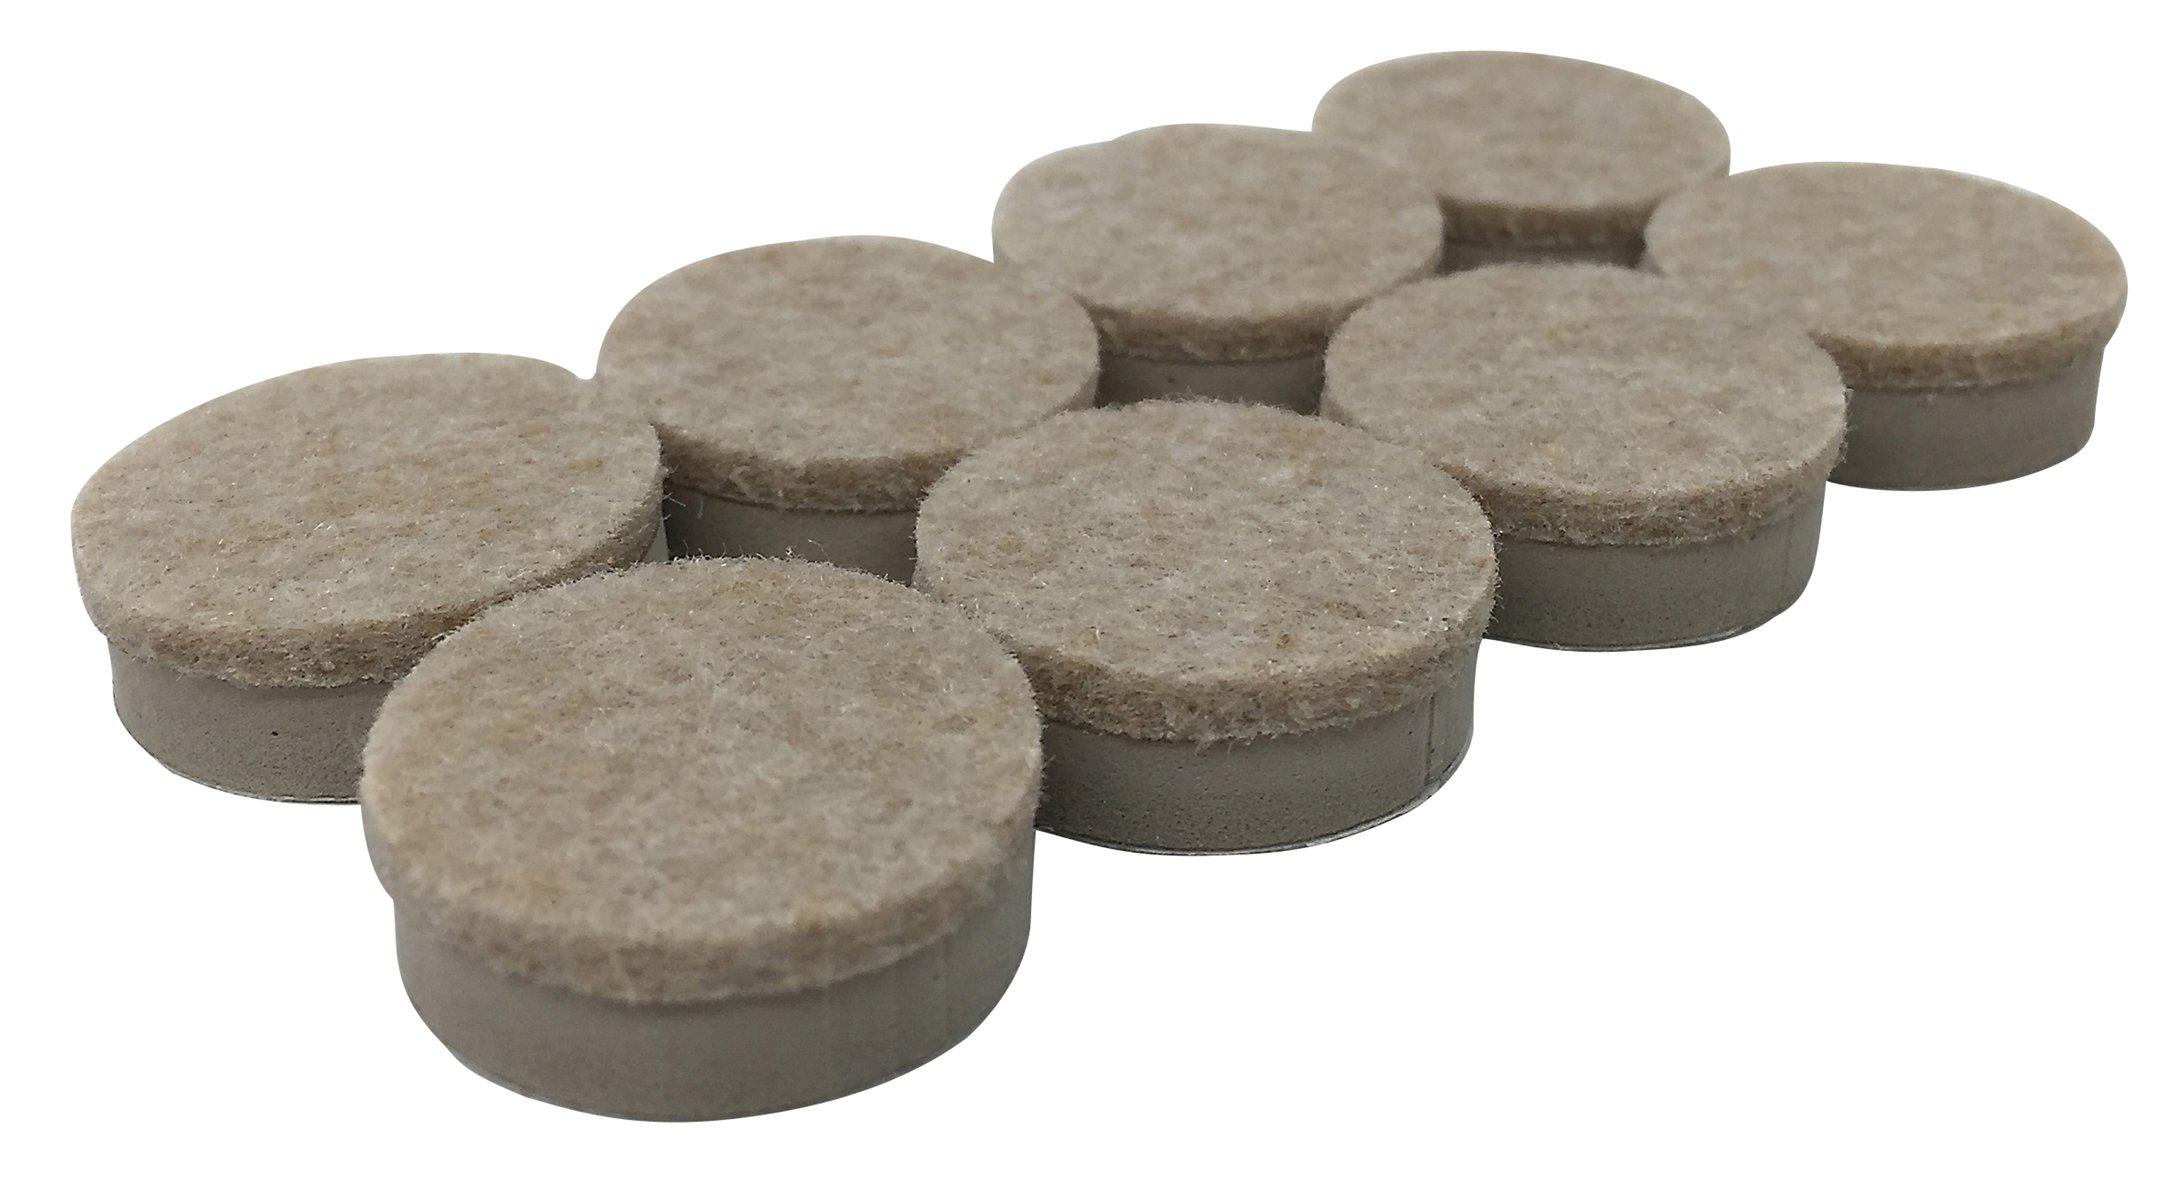 Shepherd Hardware 9915 1-Inch Heavy Duty Felt Gard Self-Adhesive Leveling Furniture Pads, 8-Pack